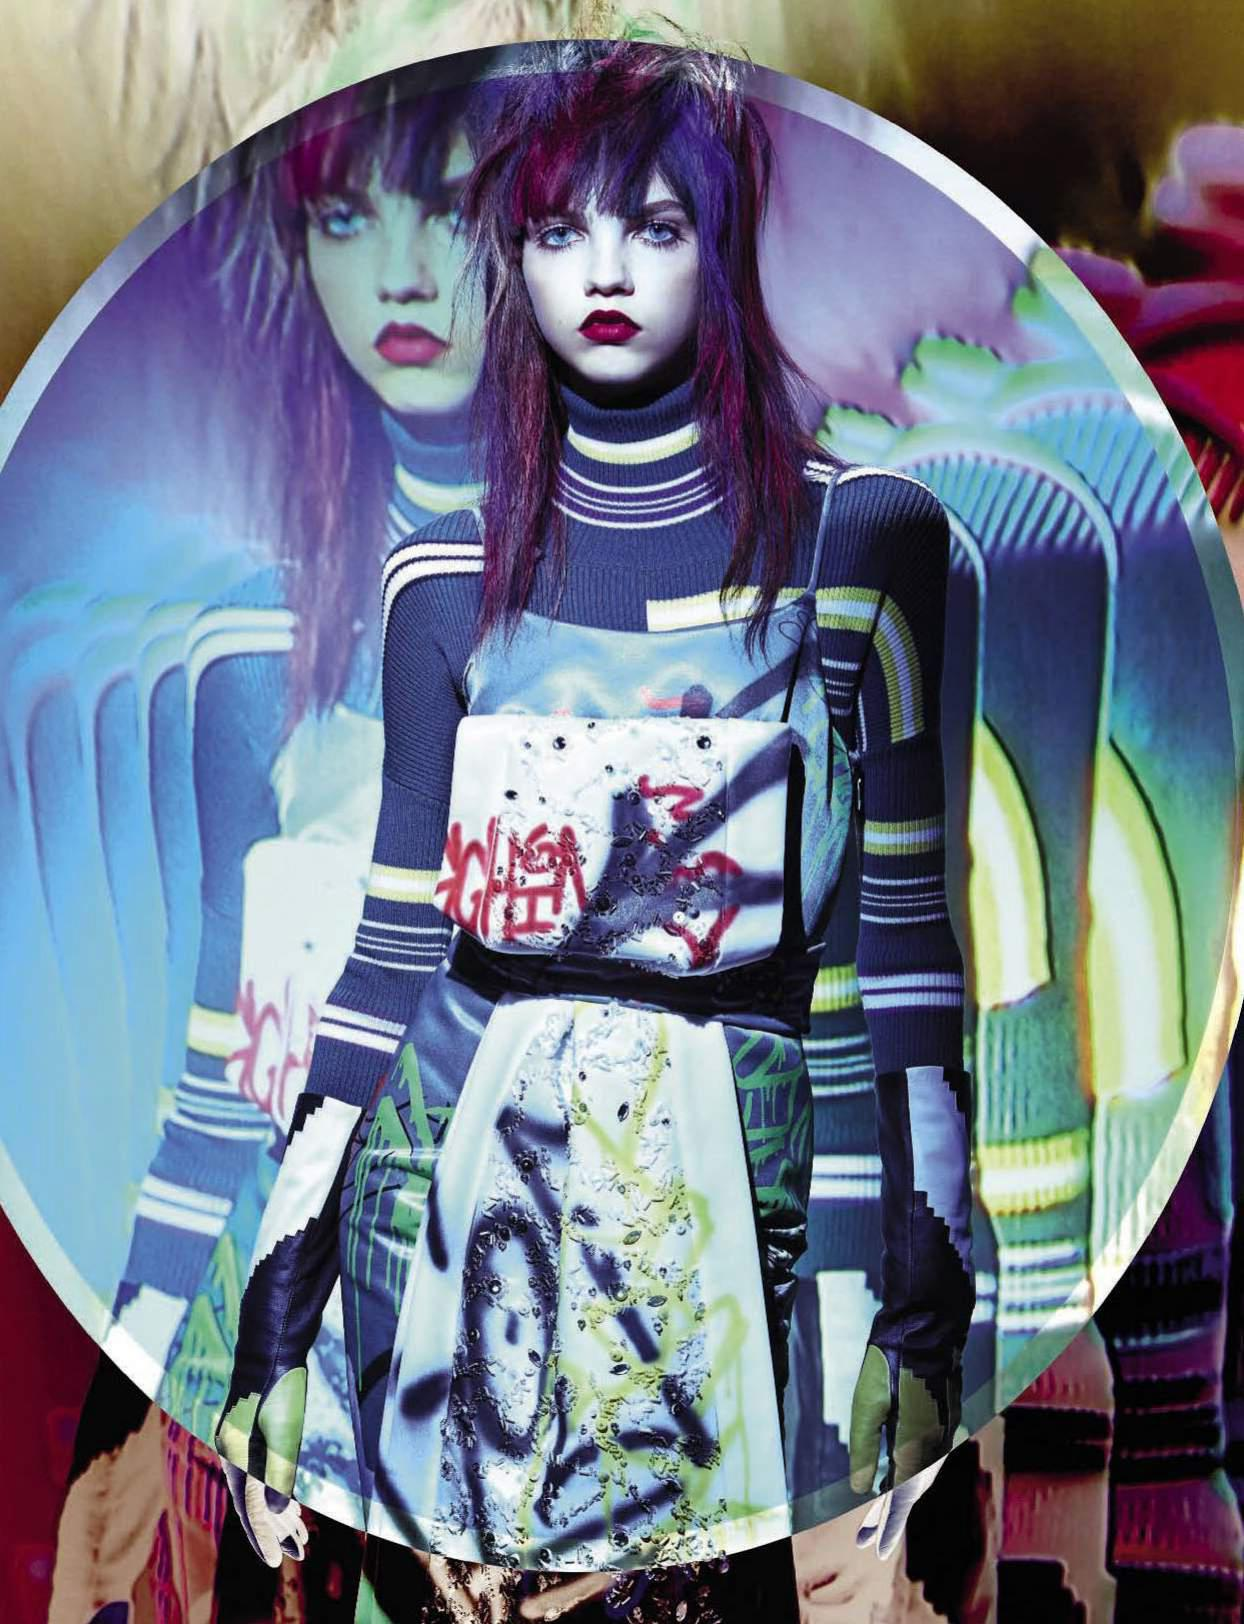 RT @fashioncowmag: @TheValGarland skin hypnotizes blue eyes shine 'Kaleidoscopic' #MollyBair @vogue_italia http://t.co/jW8GZ4Nu5H http://t.…